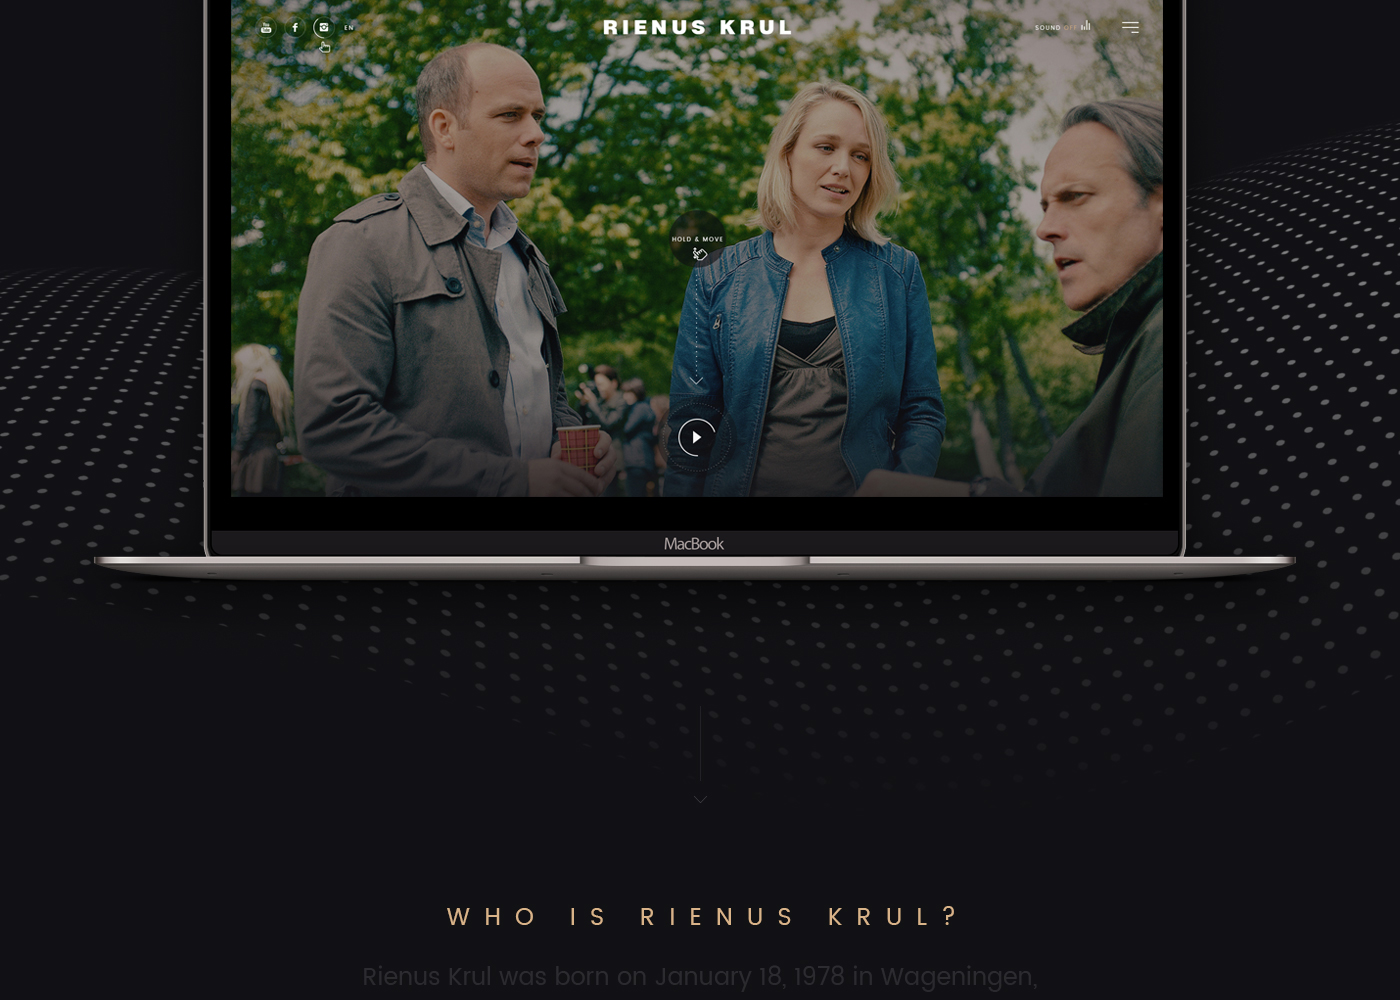 RIENUS KRUL,official,Web,Interface,interaction,design,dubai,agency,pixelzeesh,portfolio